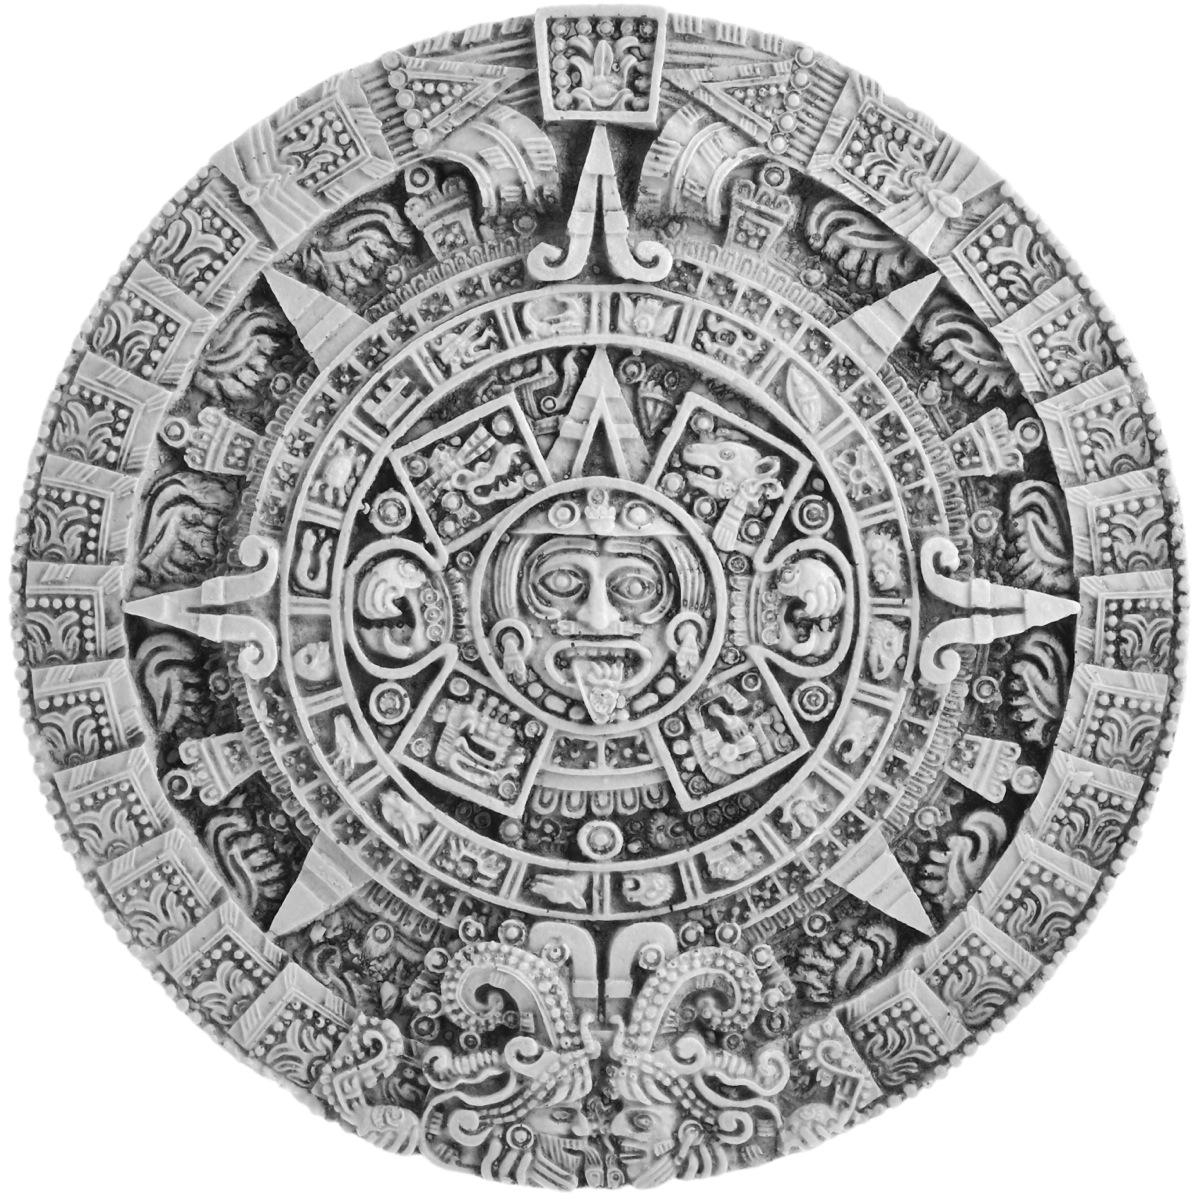 Image Result For Maya Aztec Inca